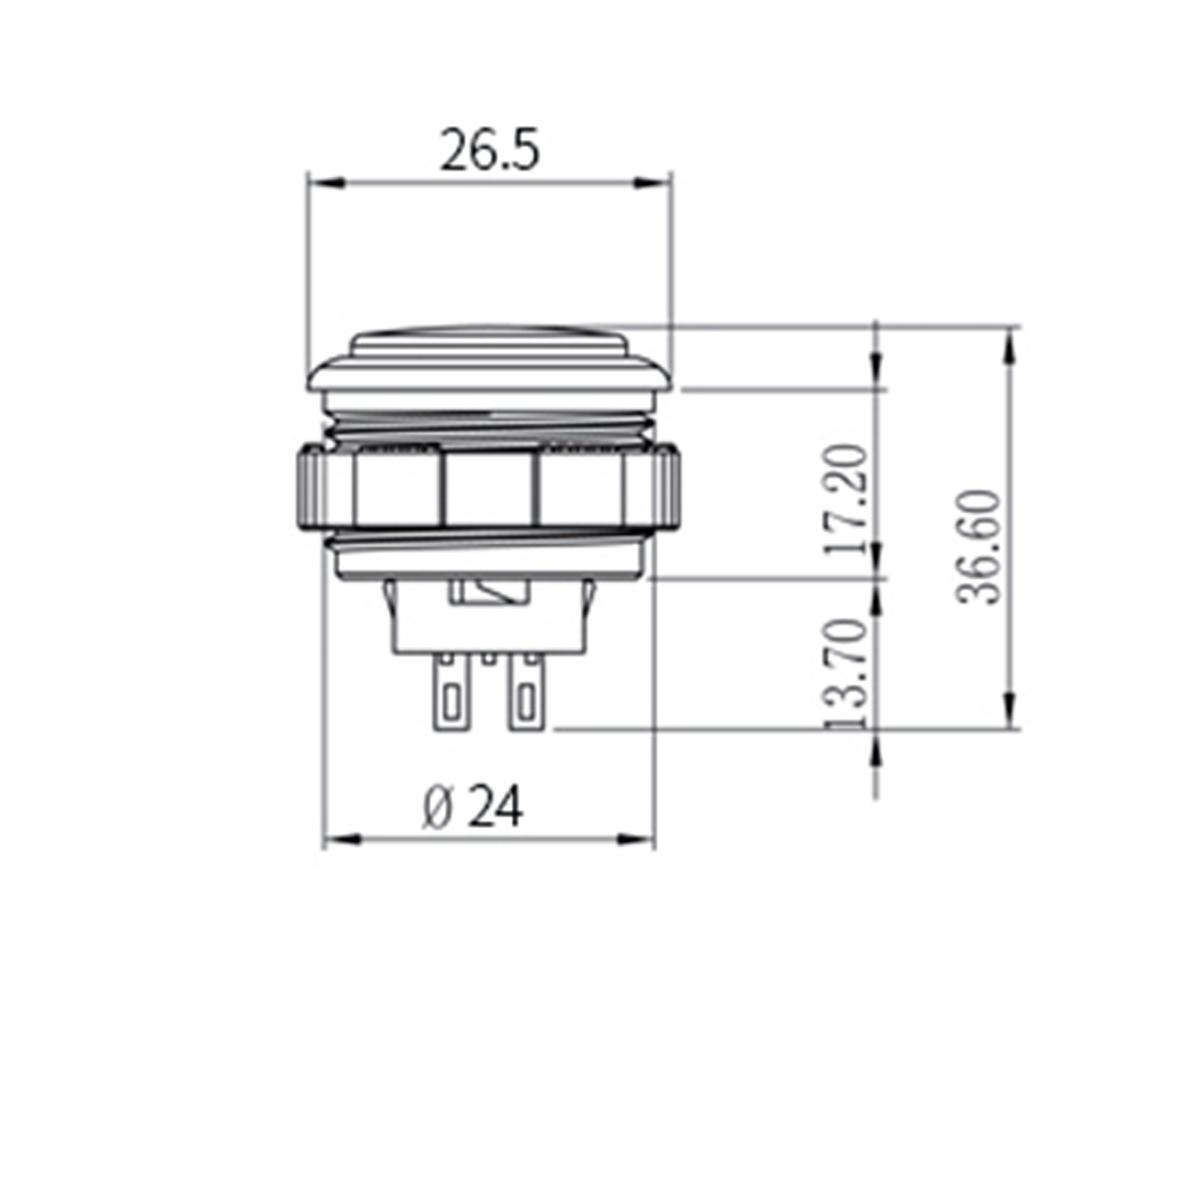 CROWN/Samducksa SDB-202 Cherry Button クラウン チェリー ボタン メタリックカラー 24mm(ネジ式)